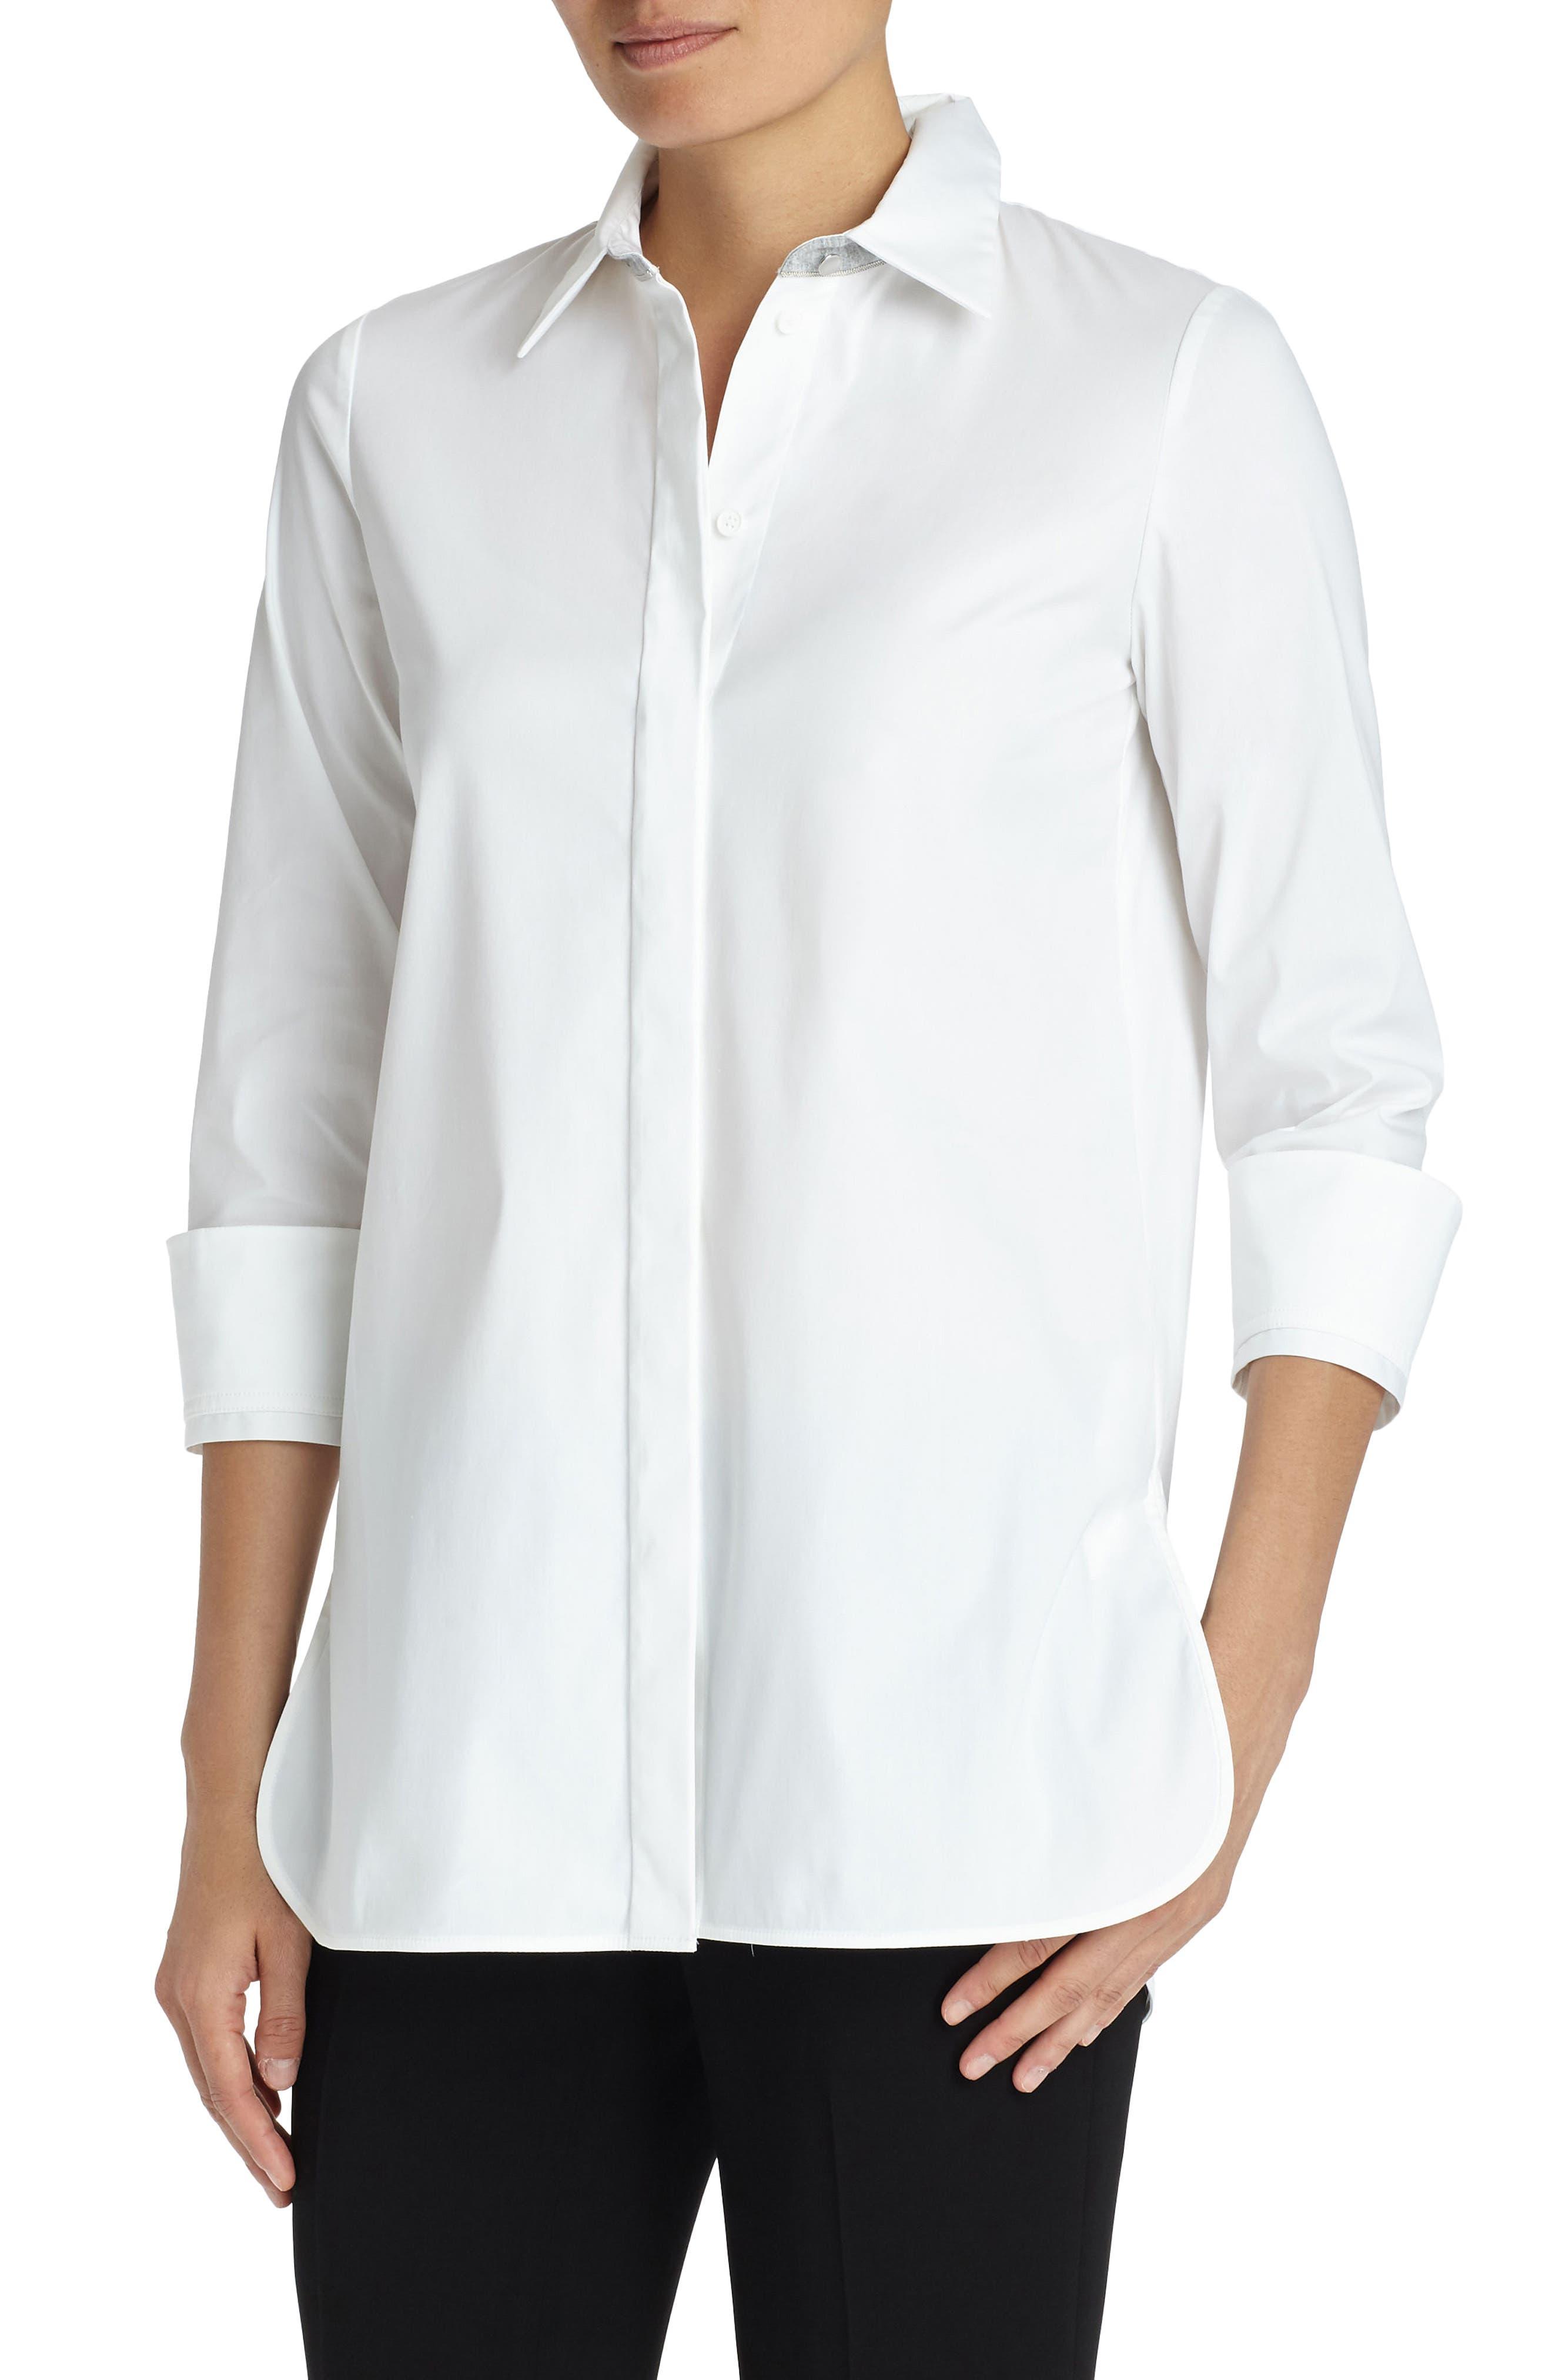 Augusta Stretch Cotton Shirt,                             Main thumbnail 1, color,                             White